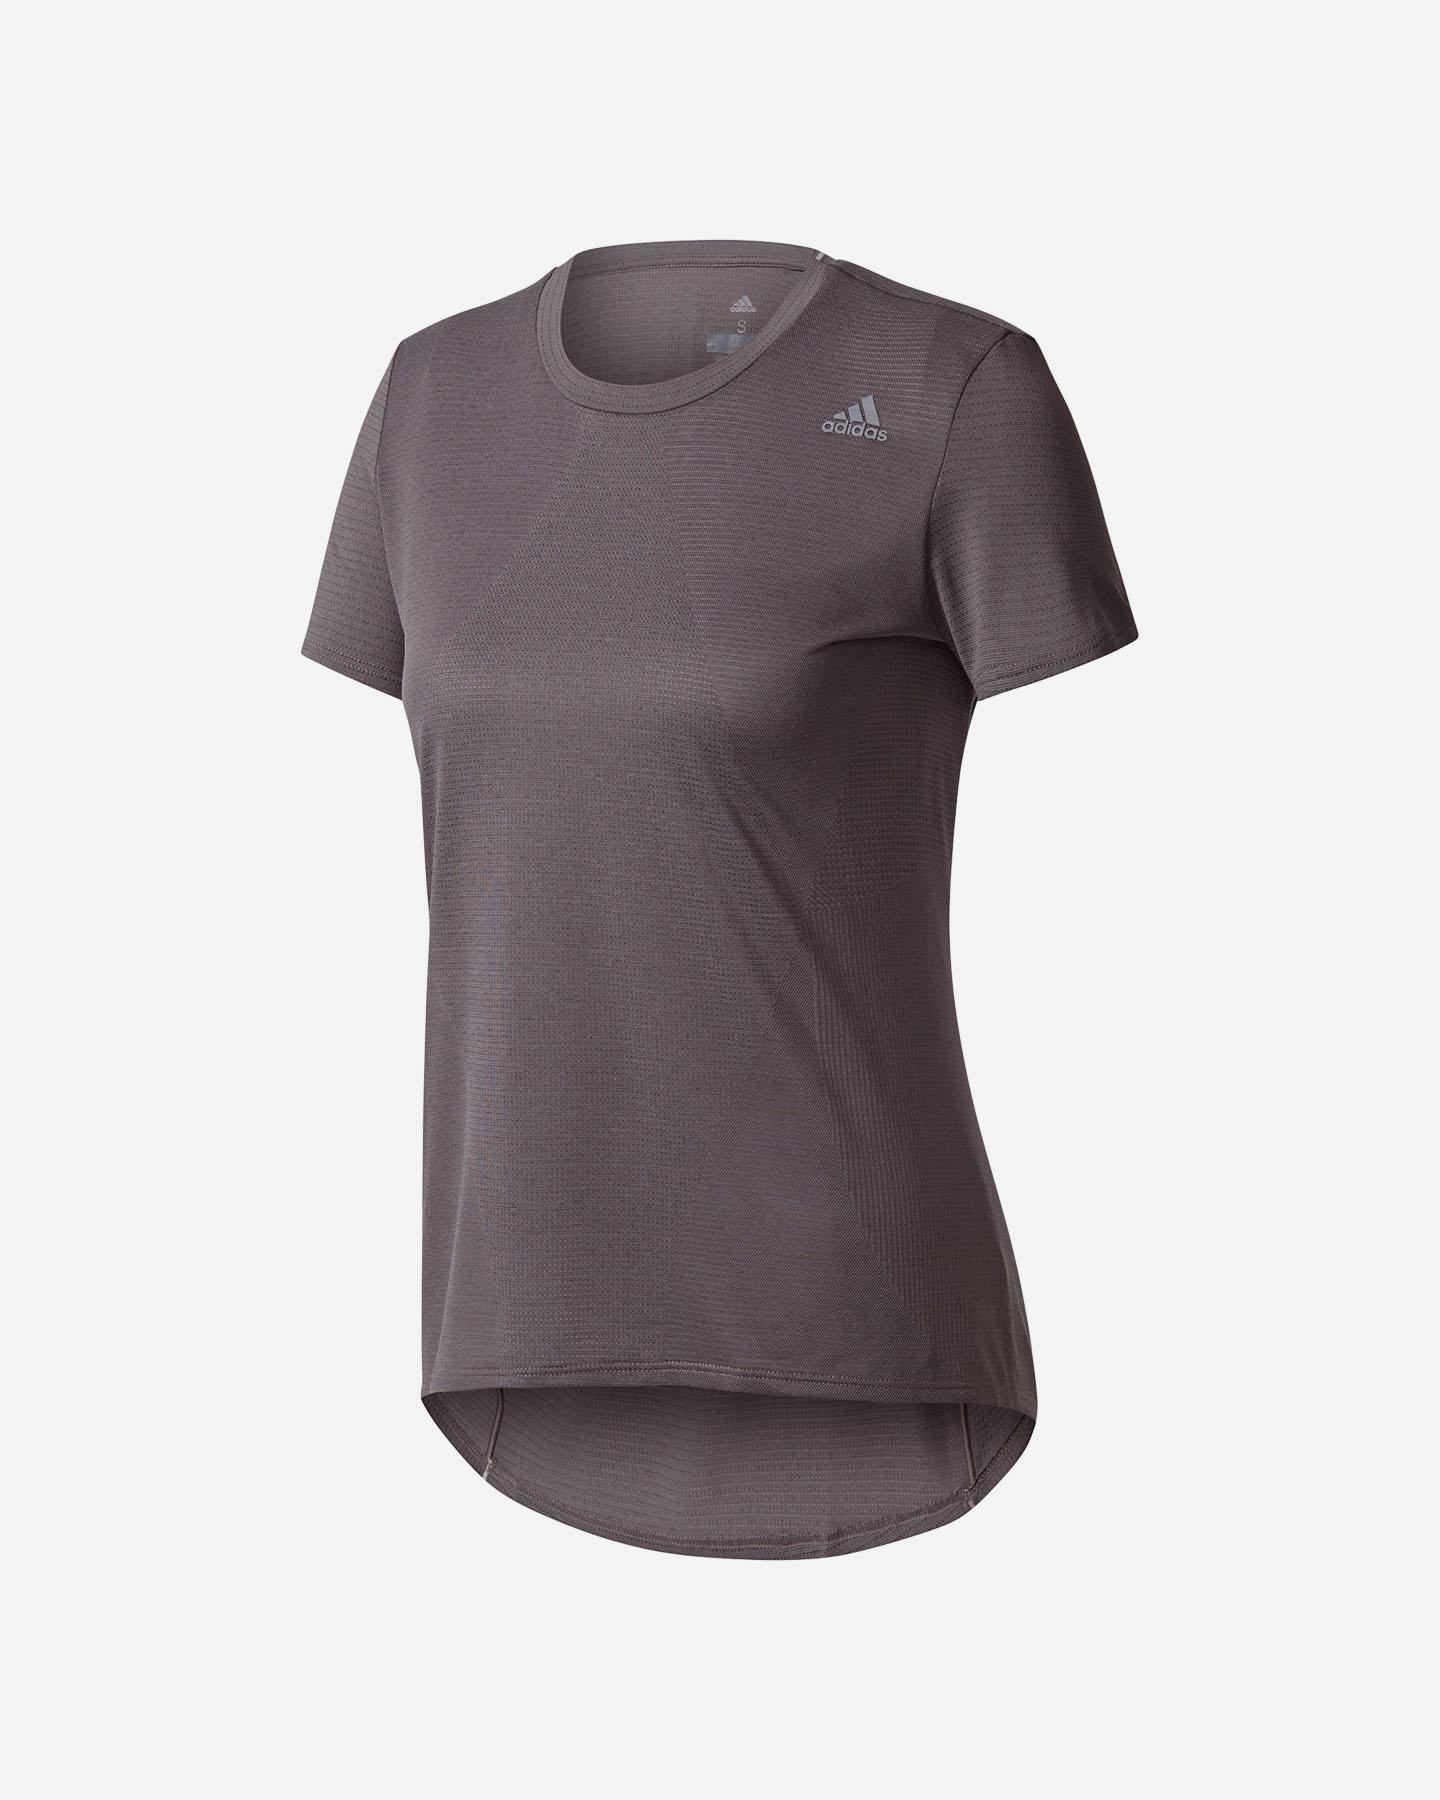 T shirt & canotte | Adidas Supernova Tee